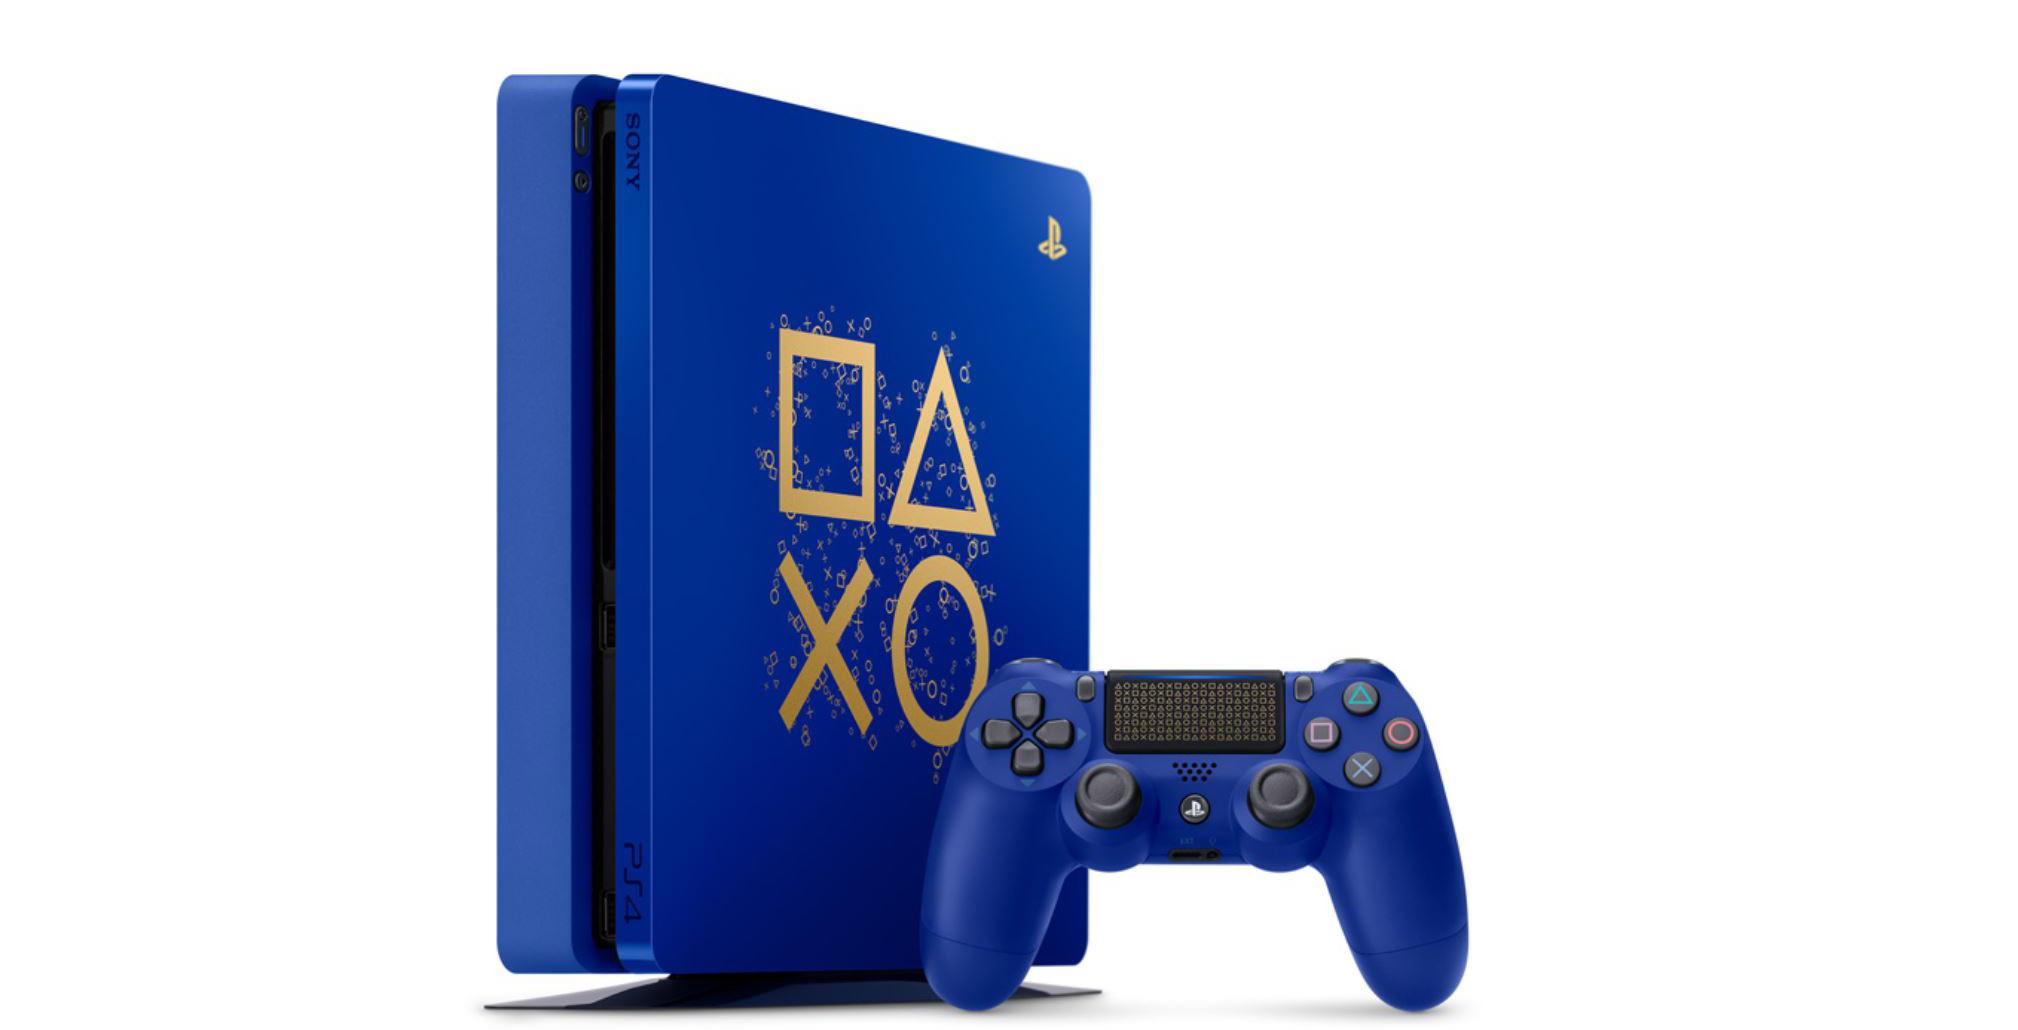 Blue PS4 Slim